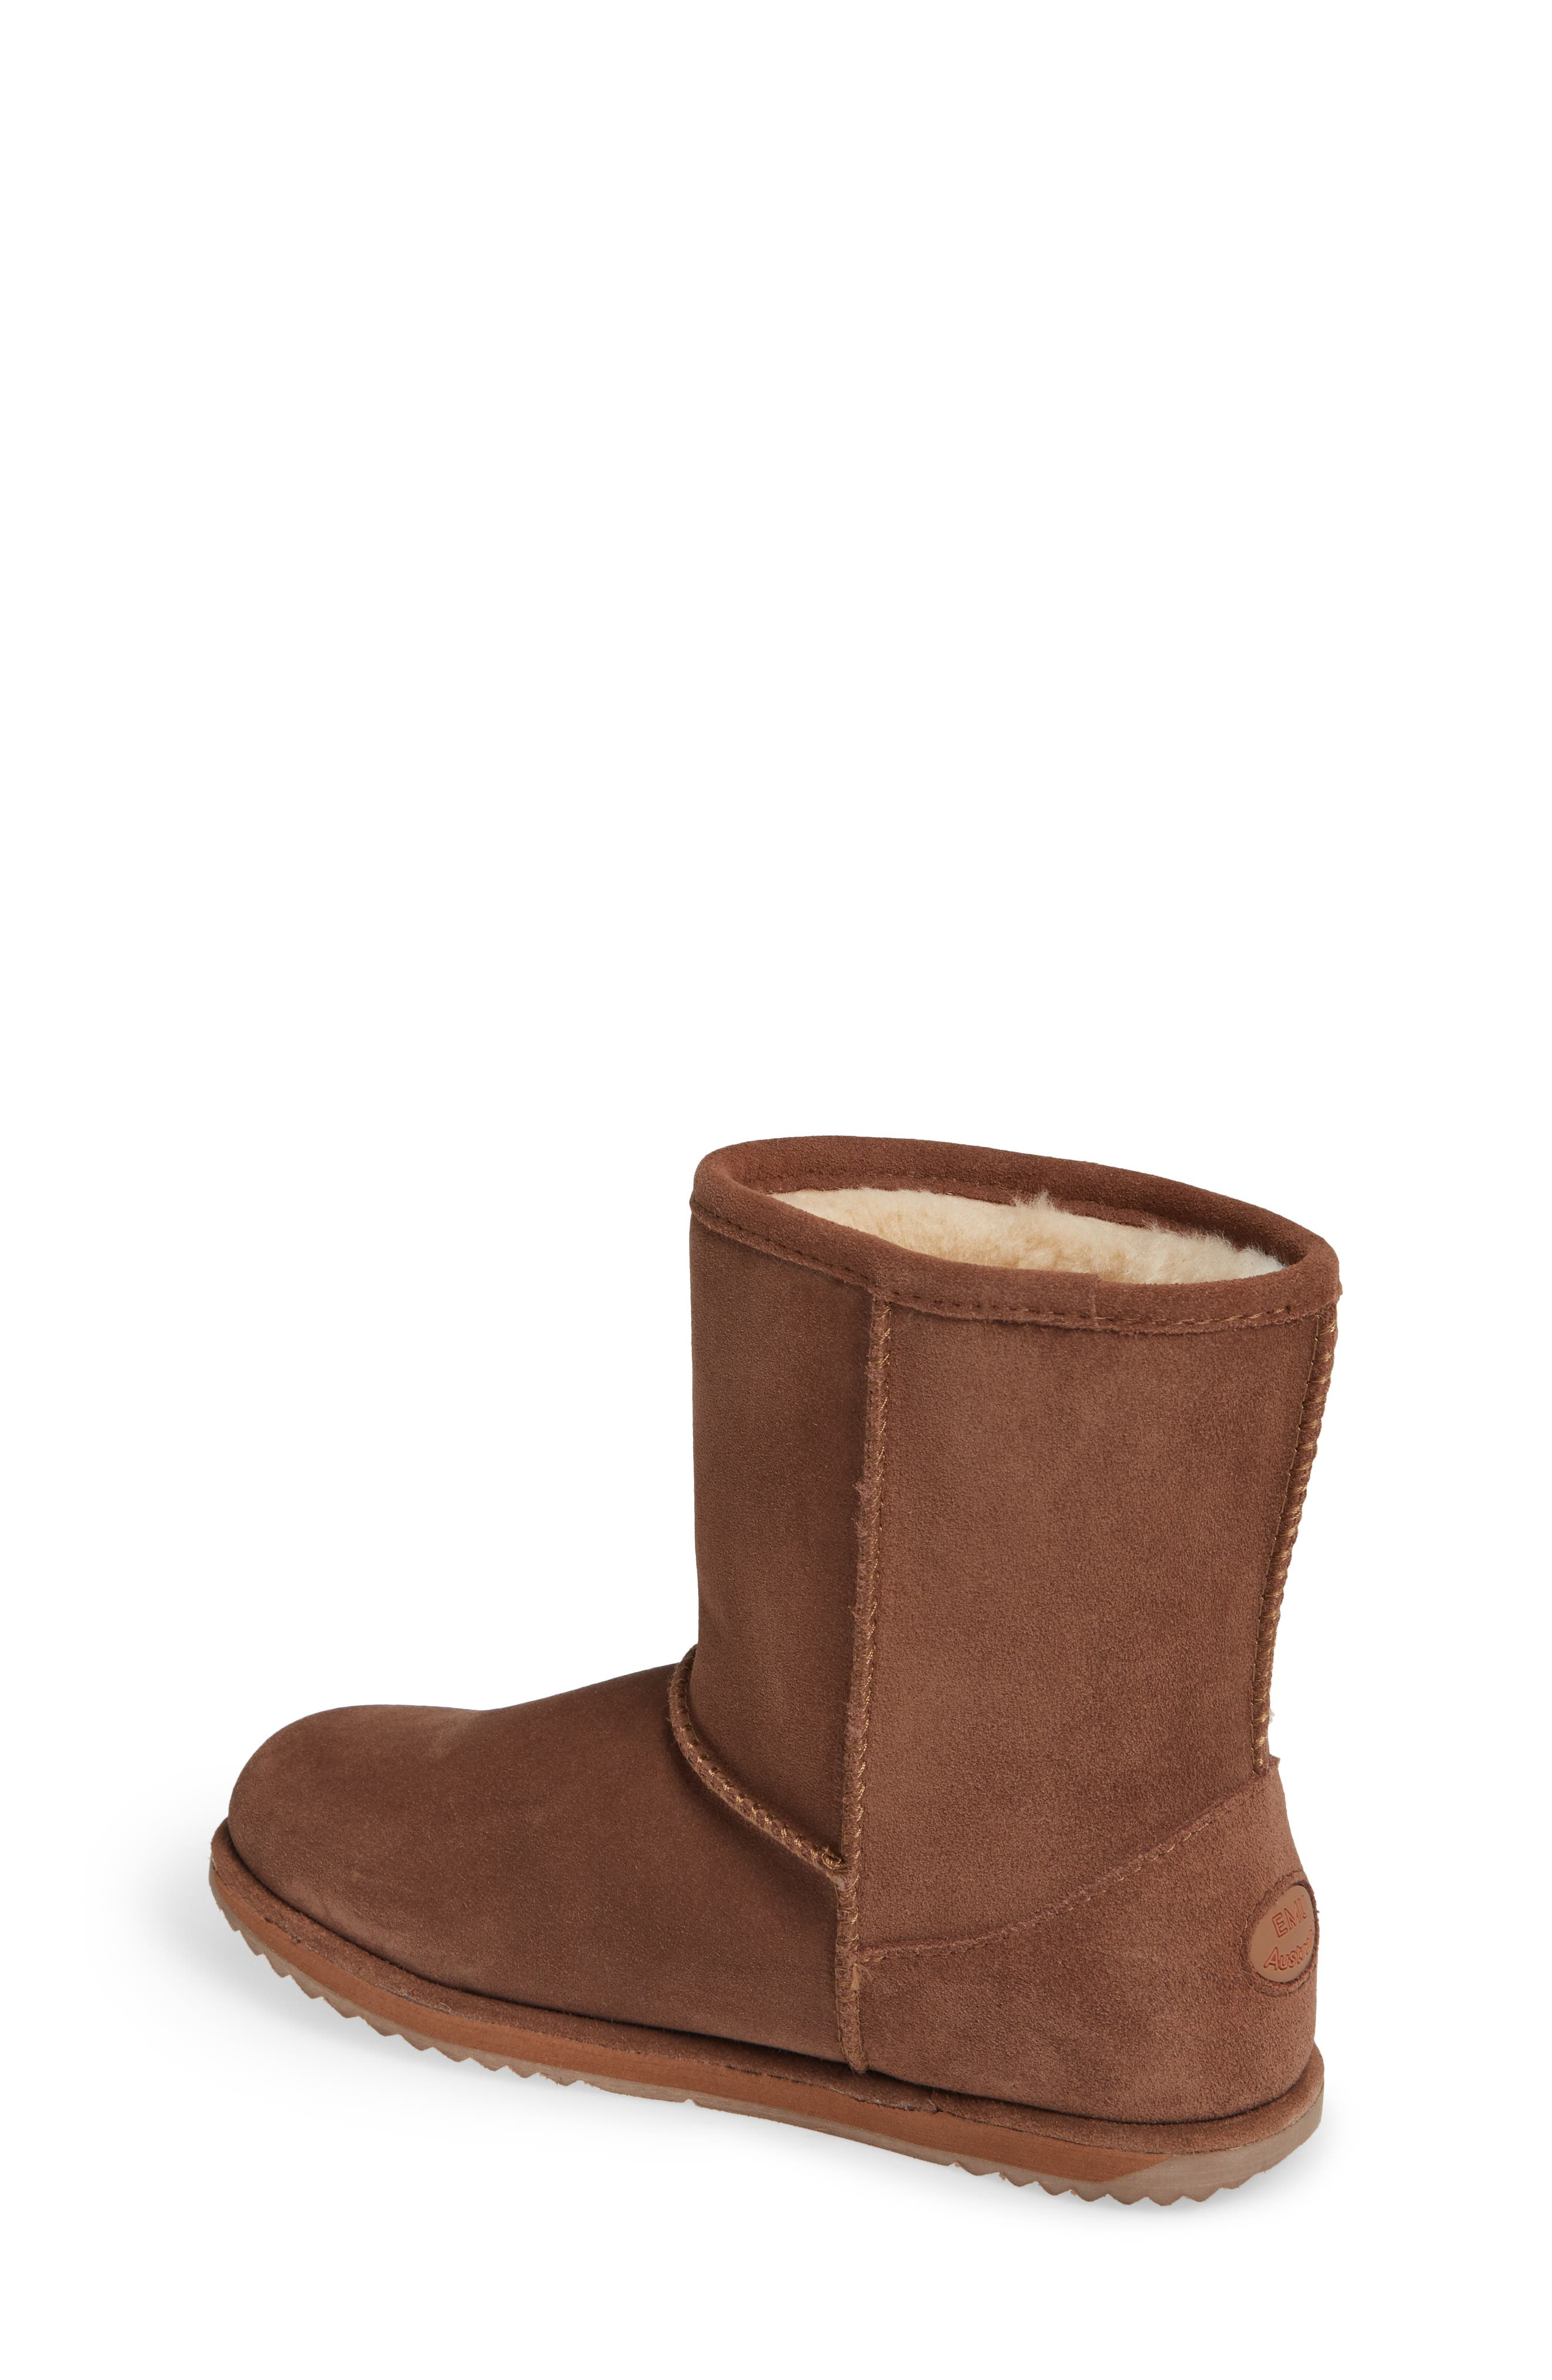 Brumby Waterproof Boot,                             Alternate thumbnail 2, color,                             Oak Brown